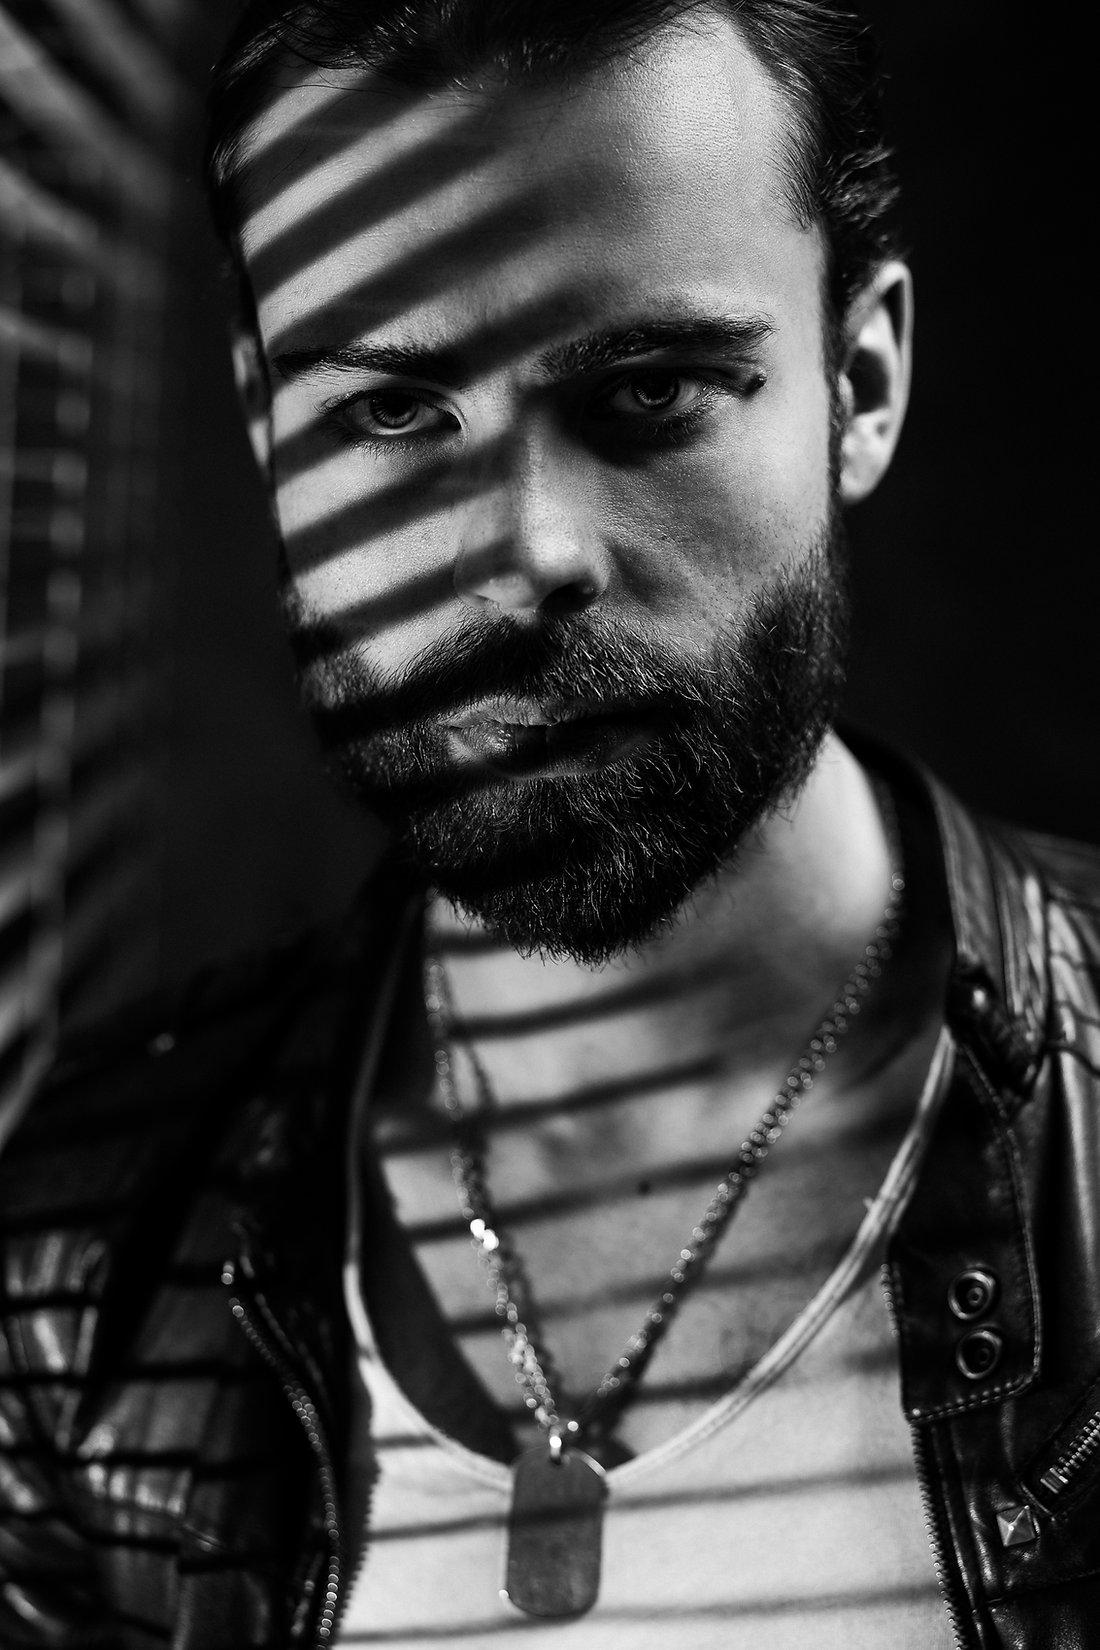 Vyro fotografija | studijinis portretas | film noir | vyro fotosesija | kinematografija